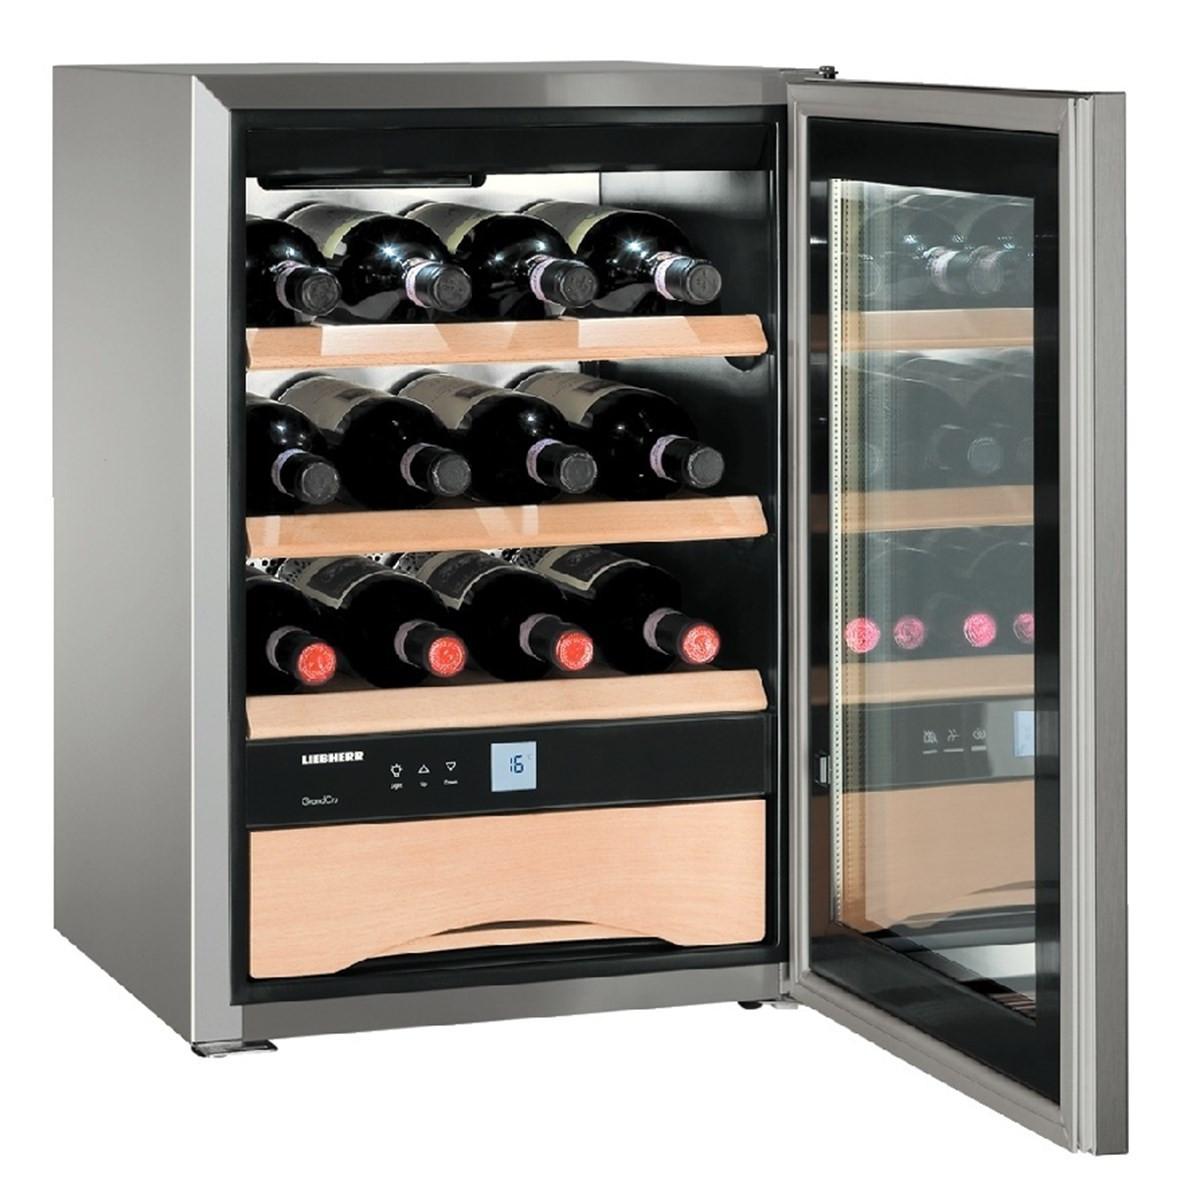 Liebherr WKes 653 Grand Cru Stainless Steel Wine Cooler